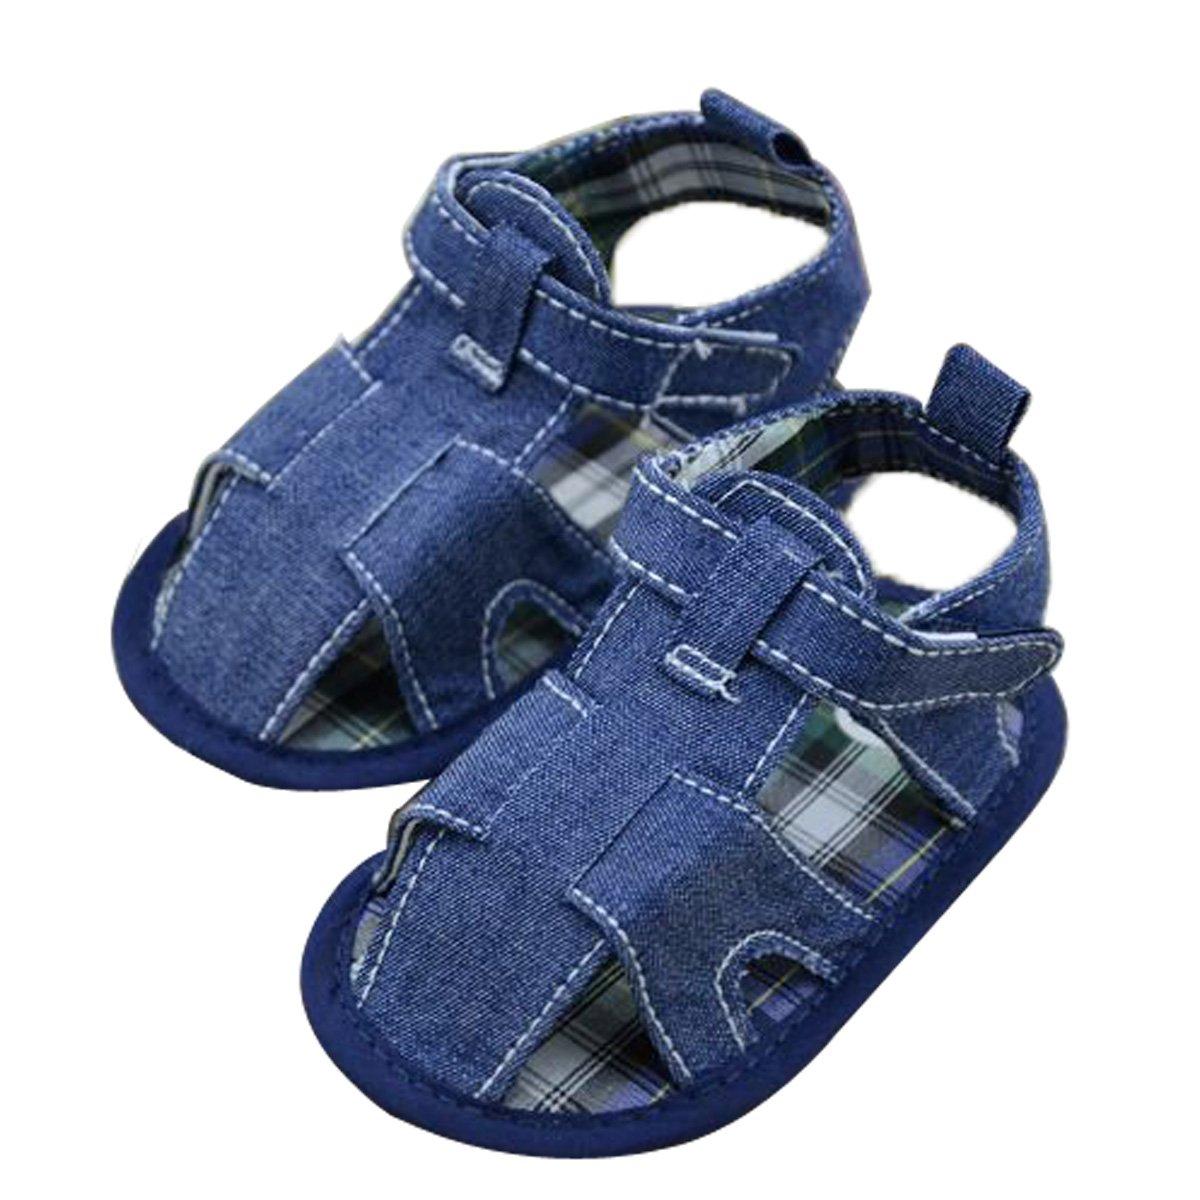 xhorizon TM FLK Baby Boys Toddler Jean Sandal Shoes Little Kid Shoes